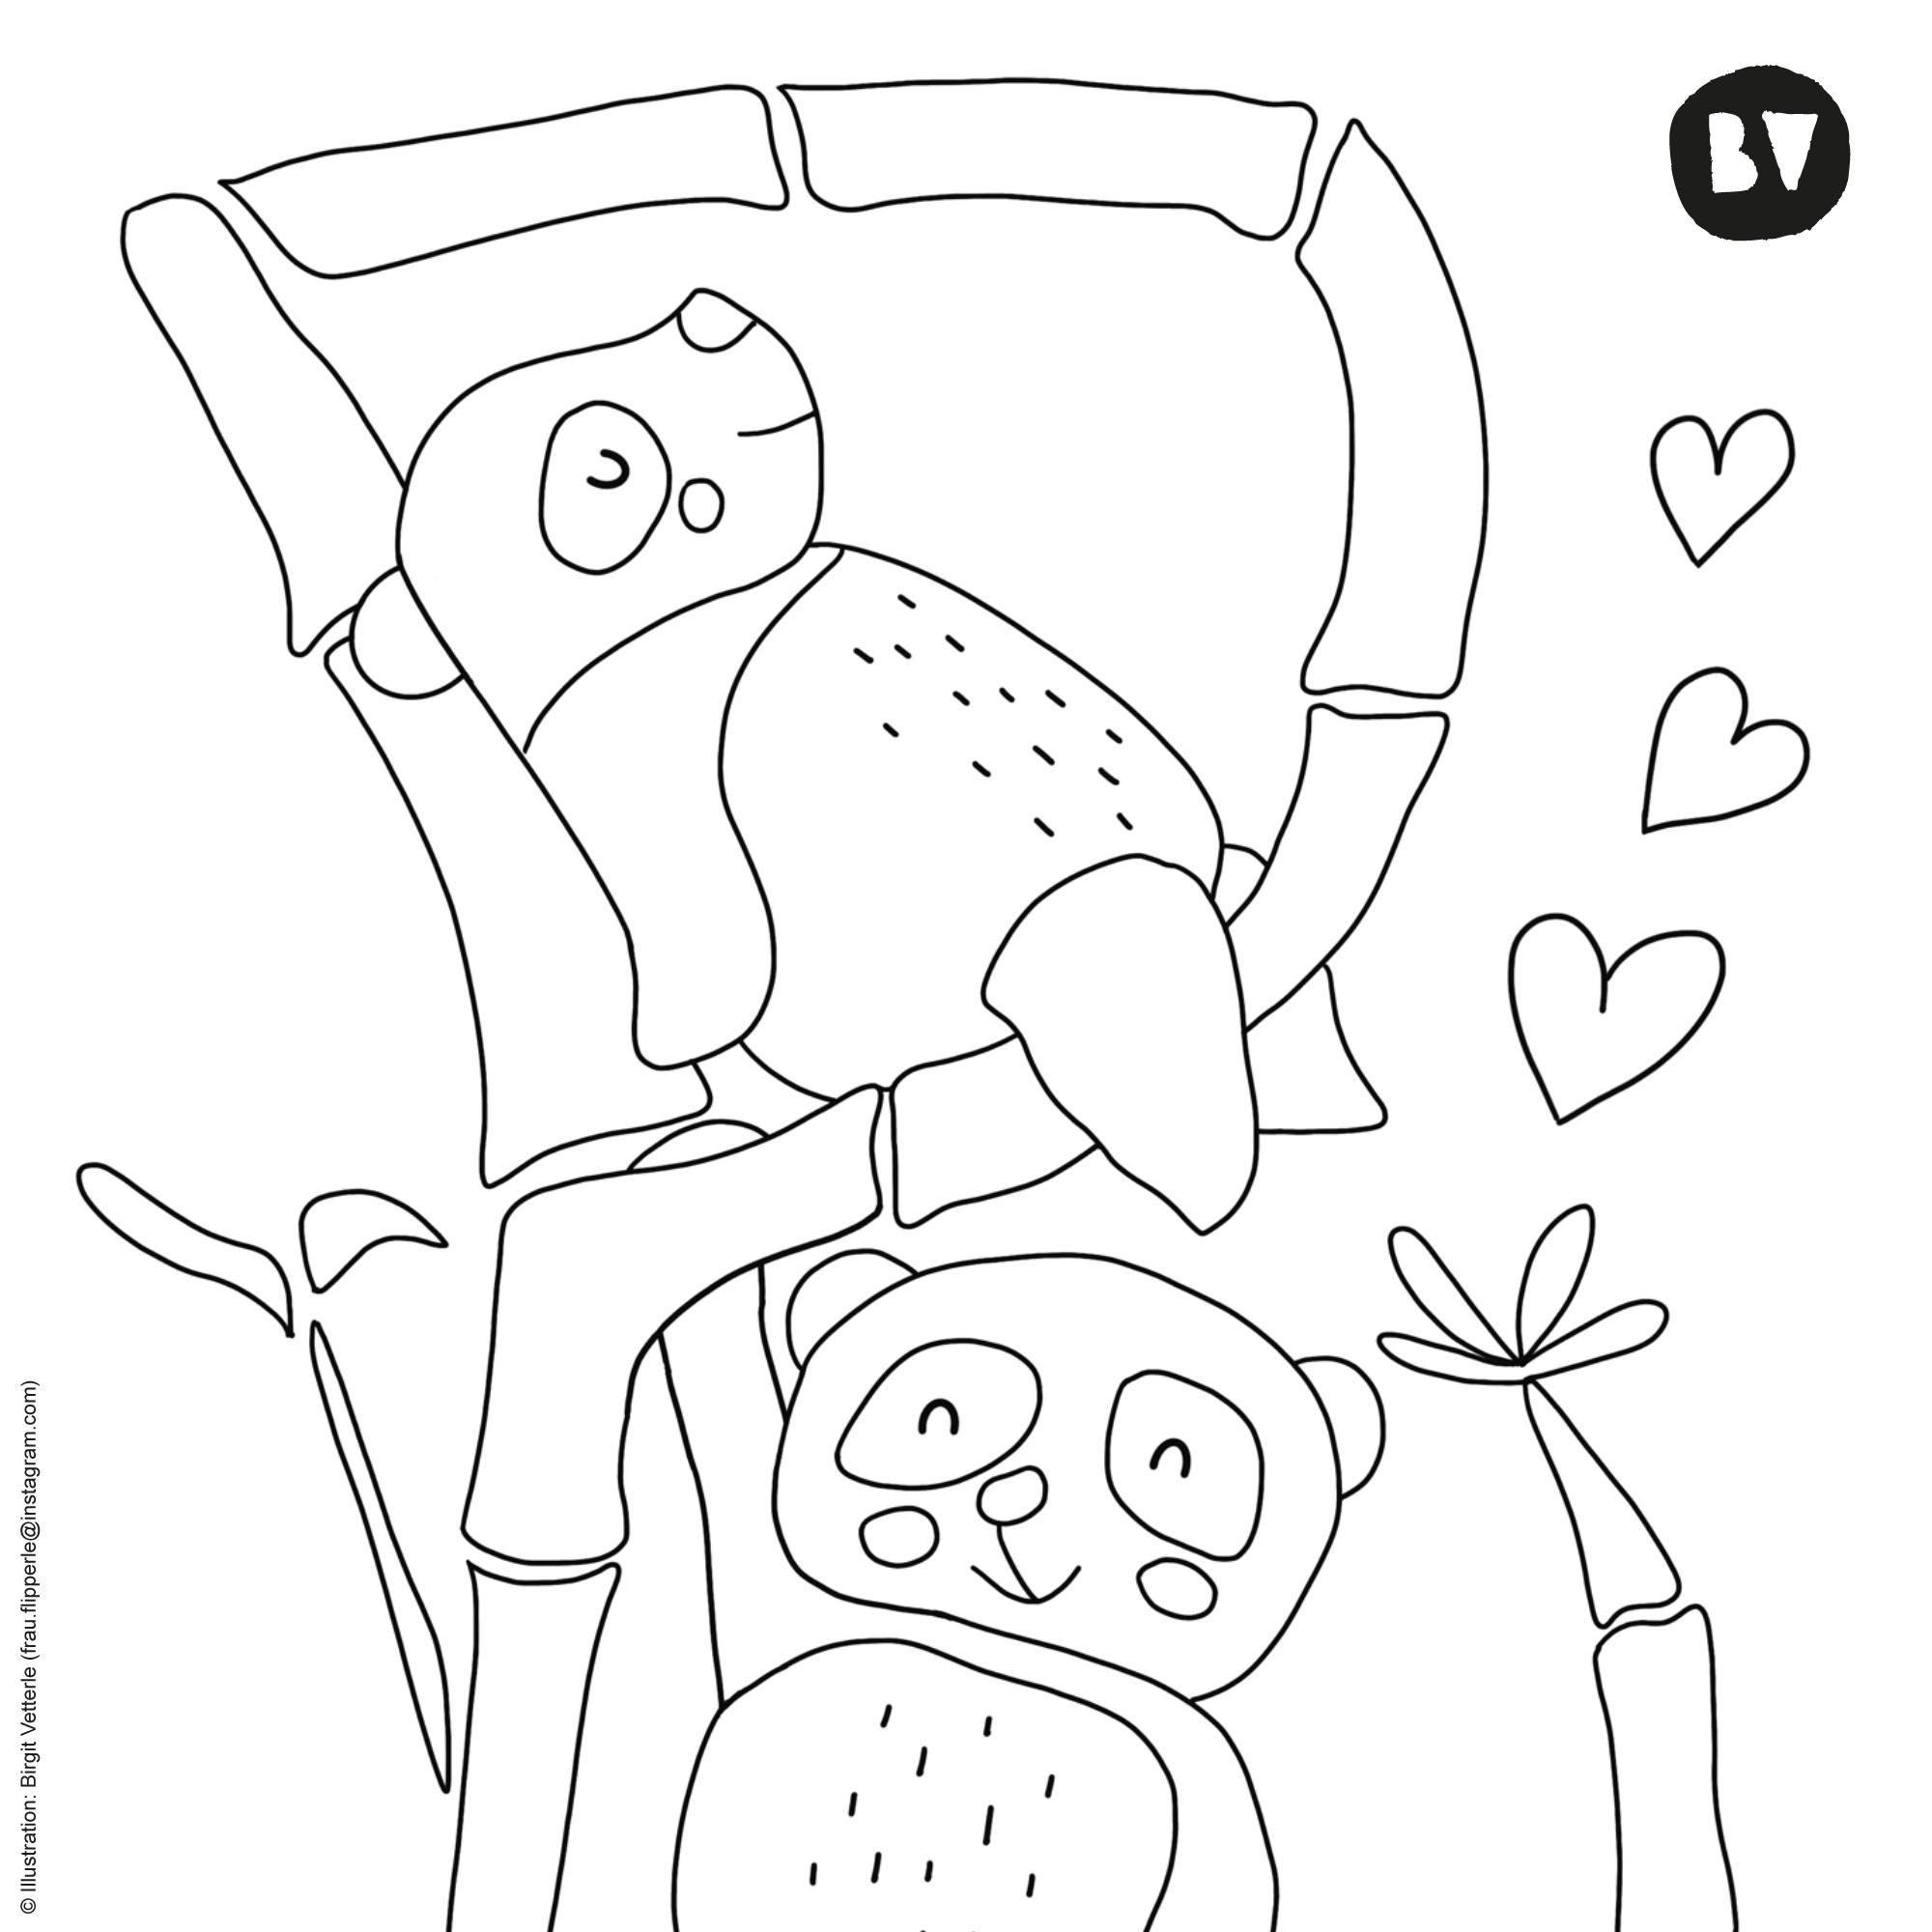 Ausmalbild P wie… Panda von Birgit Vetterle